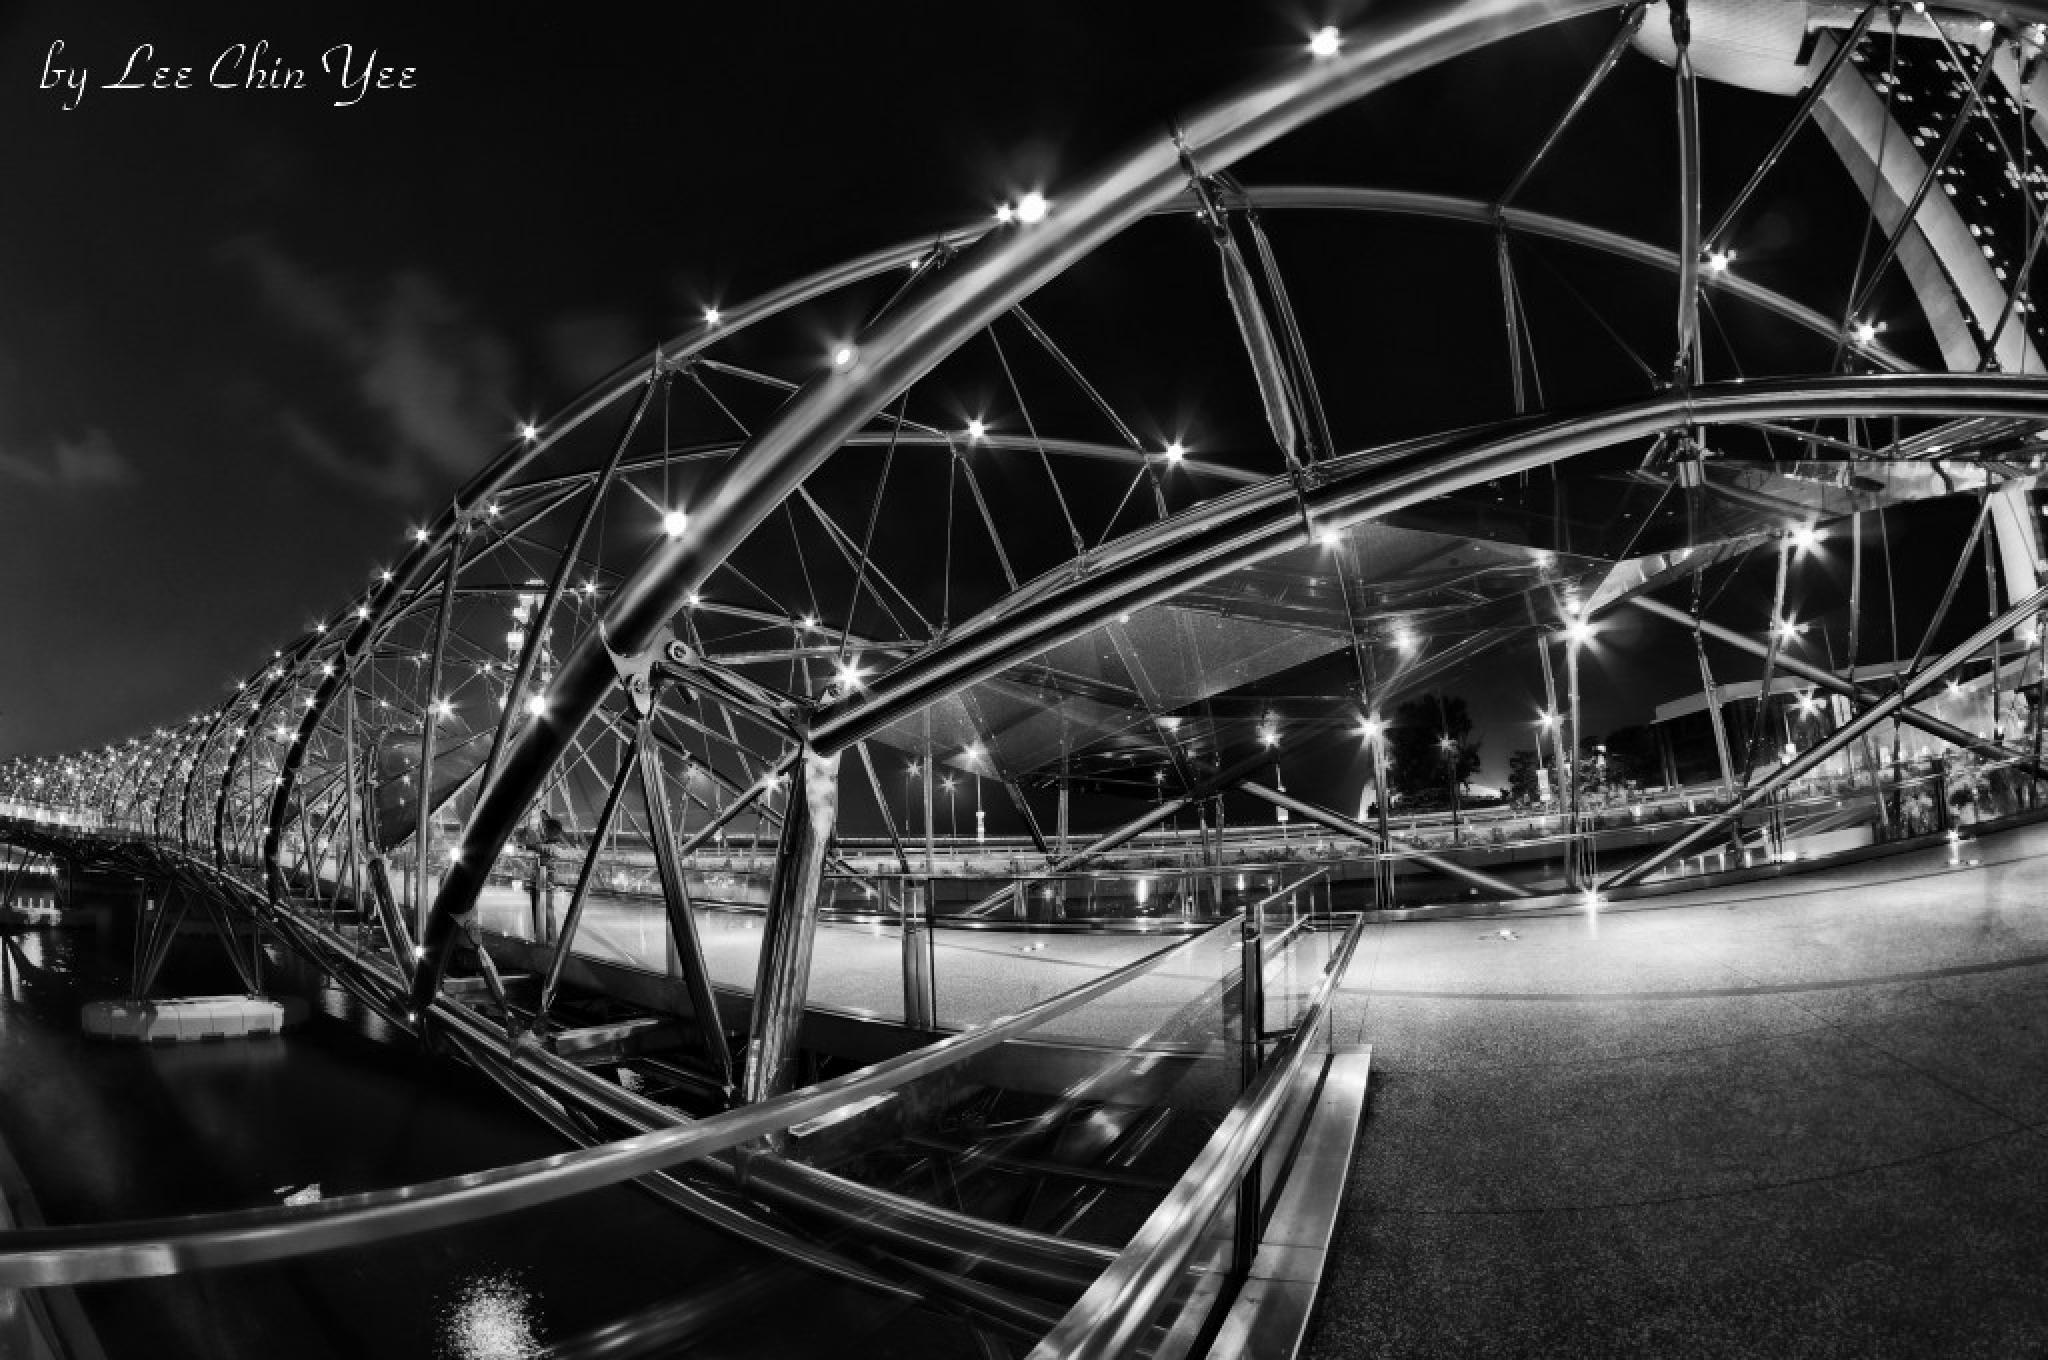 Helix Bridge, Singapore by Chinyee